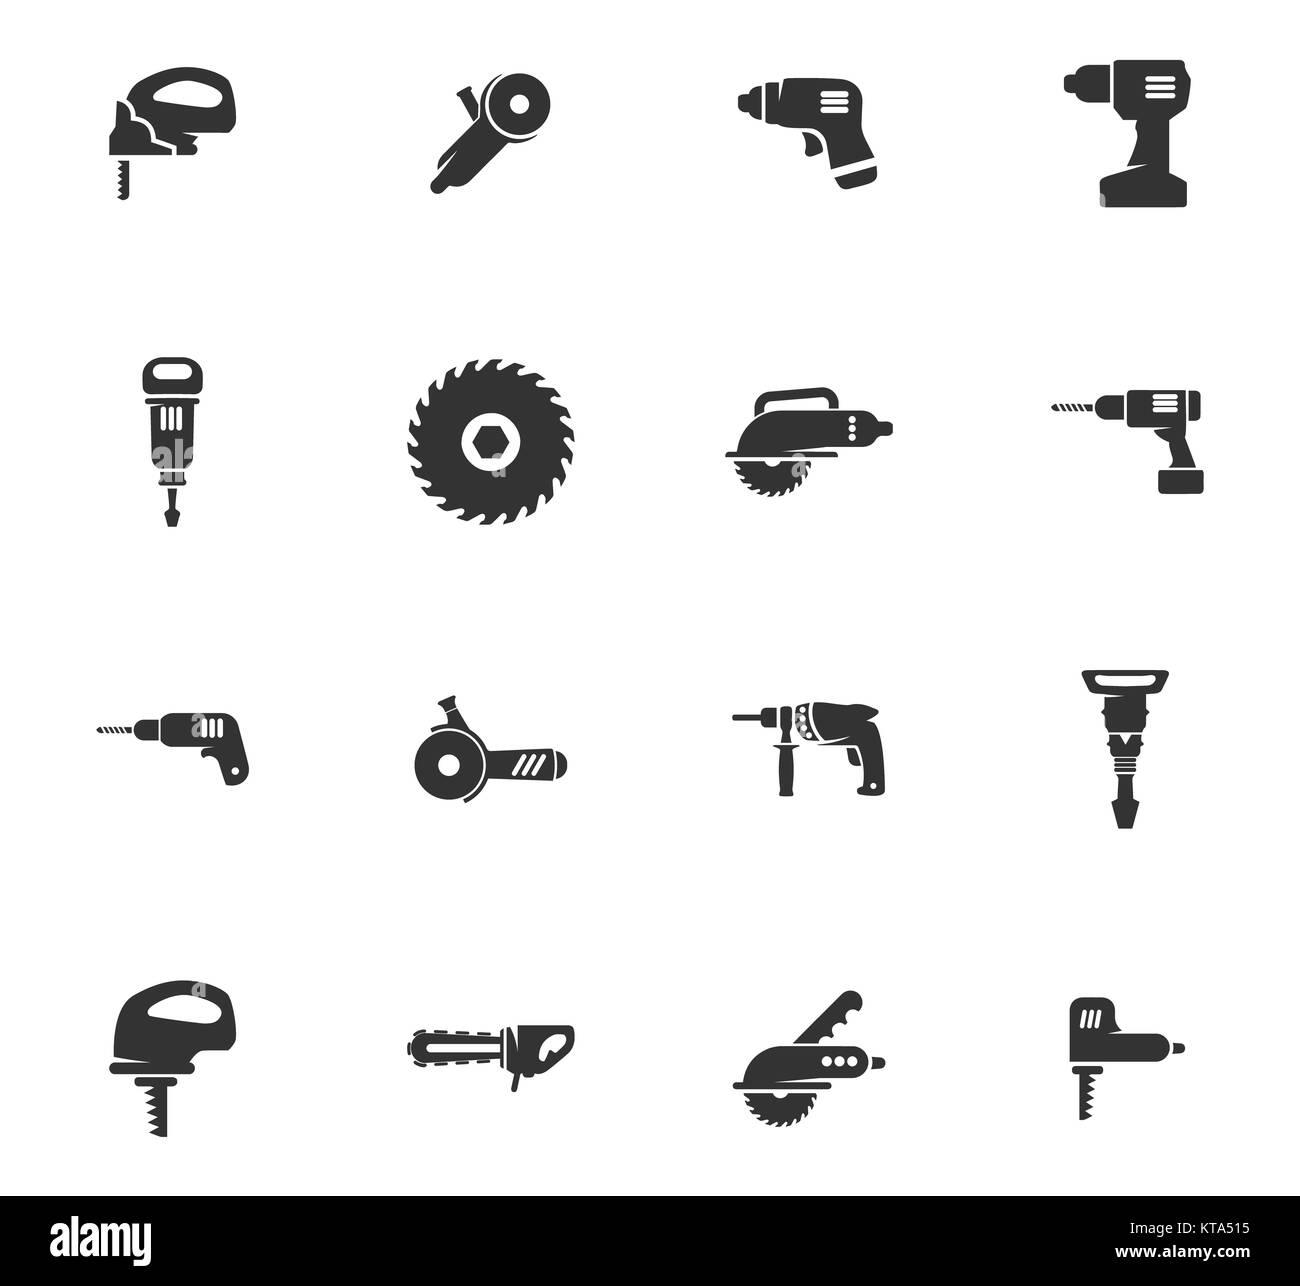 Power tools icons set - Stock Image